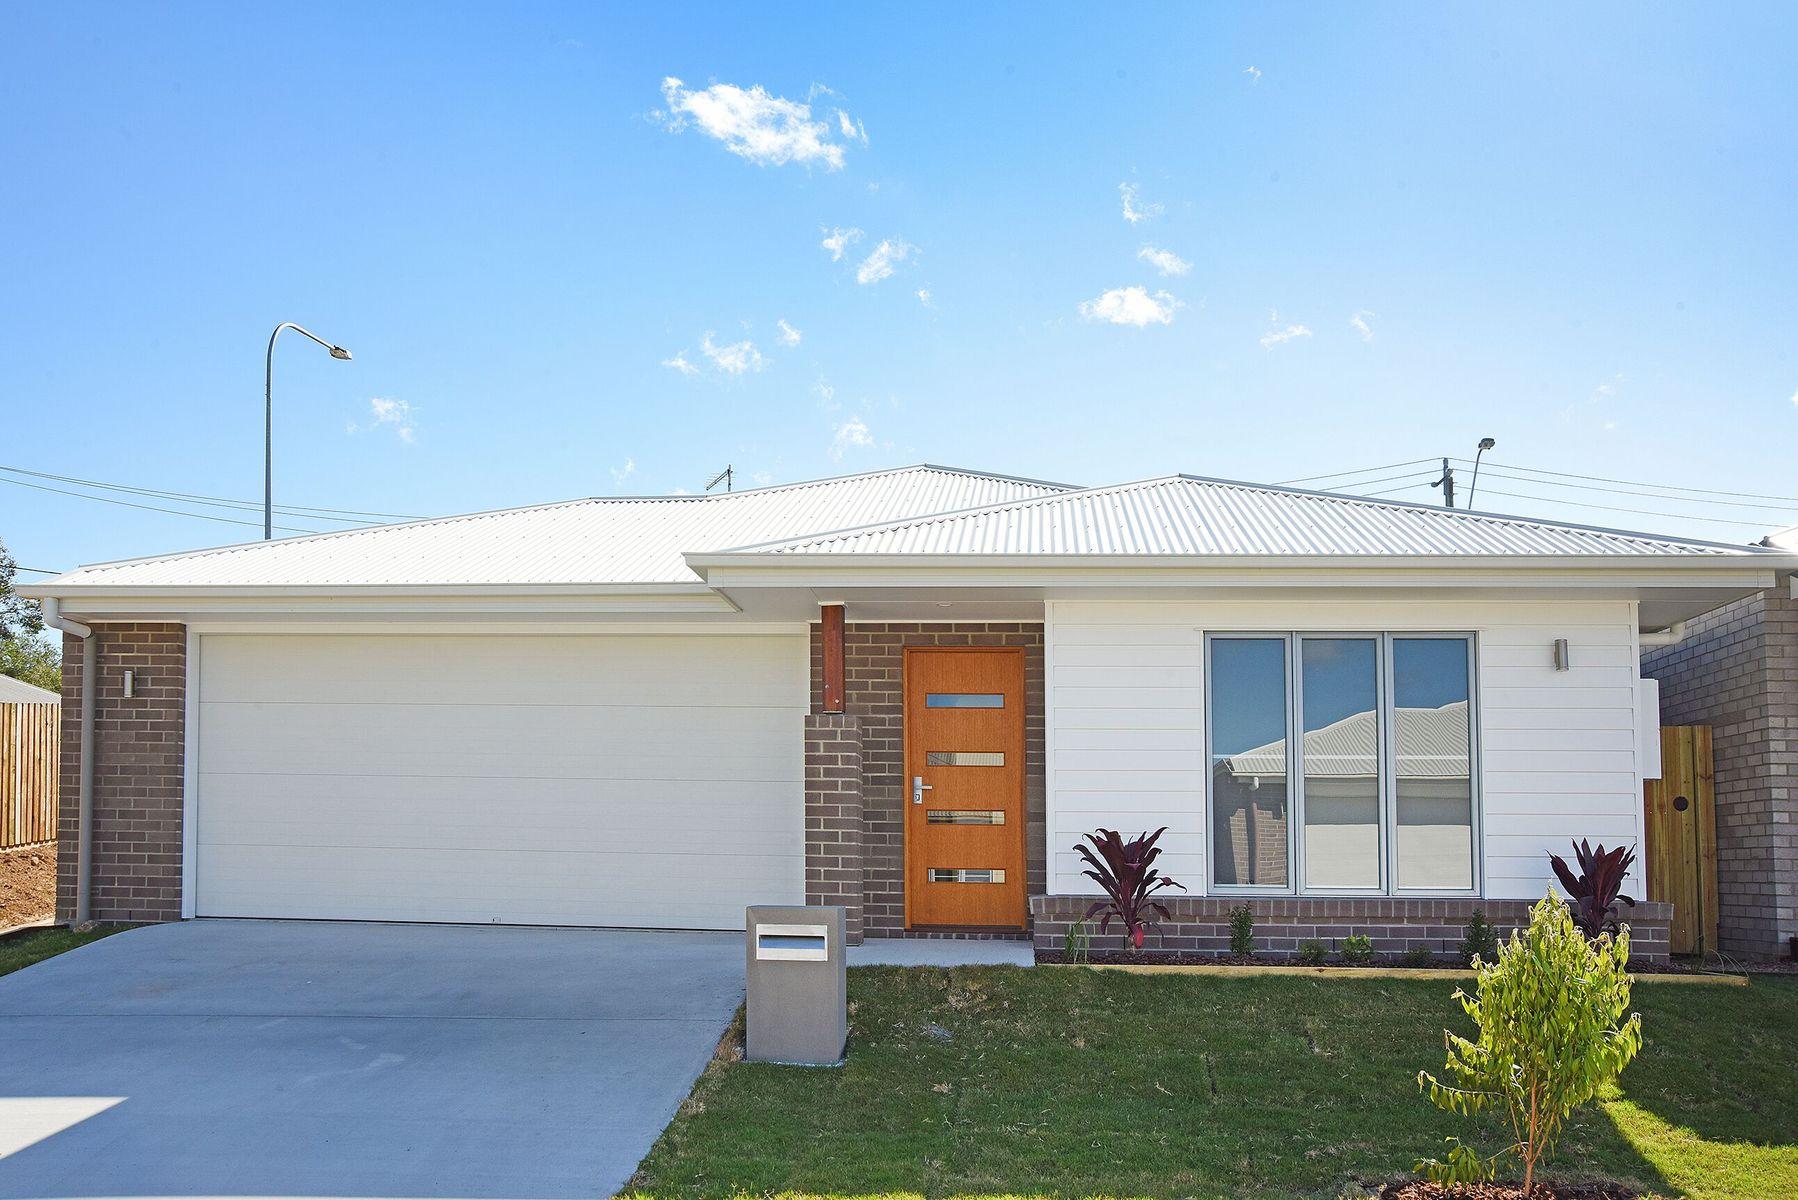 44/20 Crumpton Place, Beerwah, QLD 4519